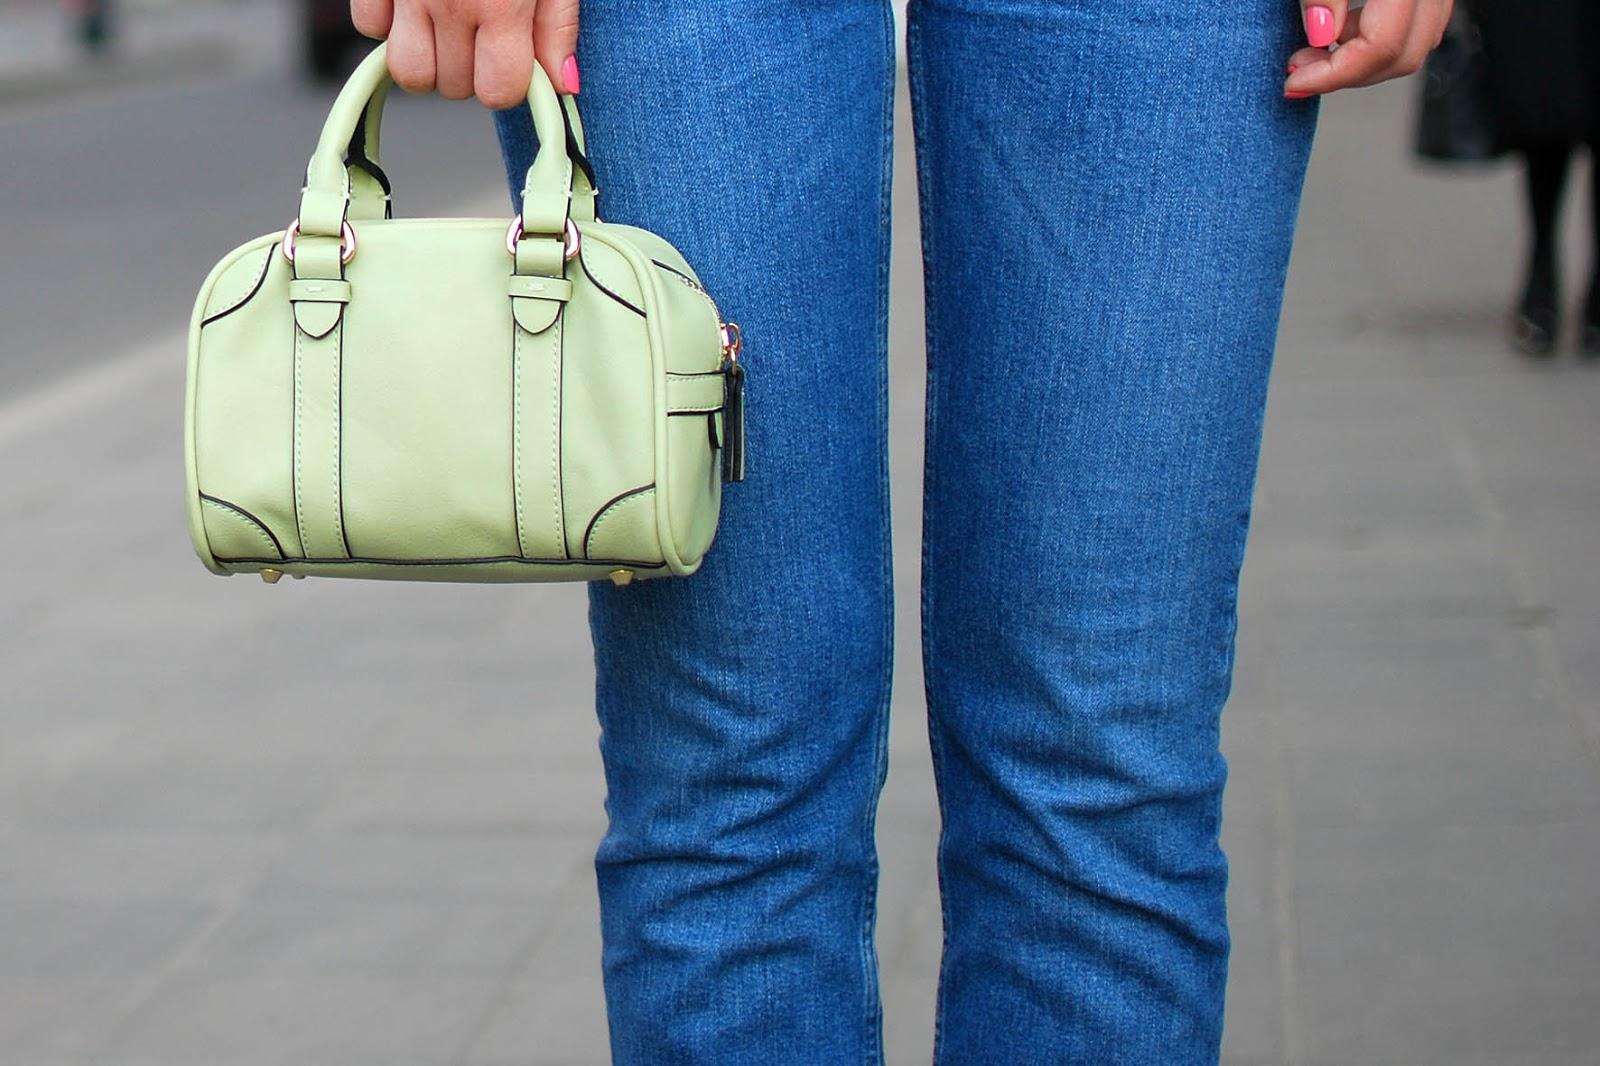 тренд микро сумки, costa de la moda blog, irina pavlova blog, уличная моды 2016 сумки